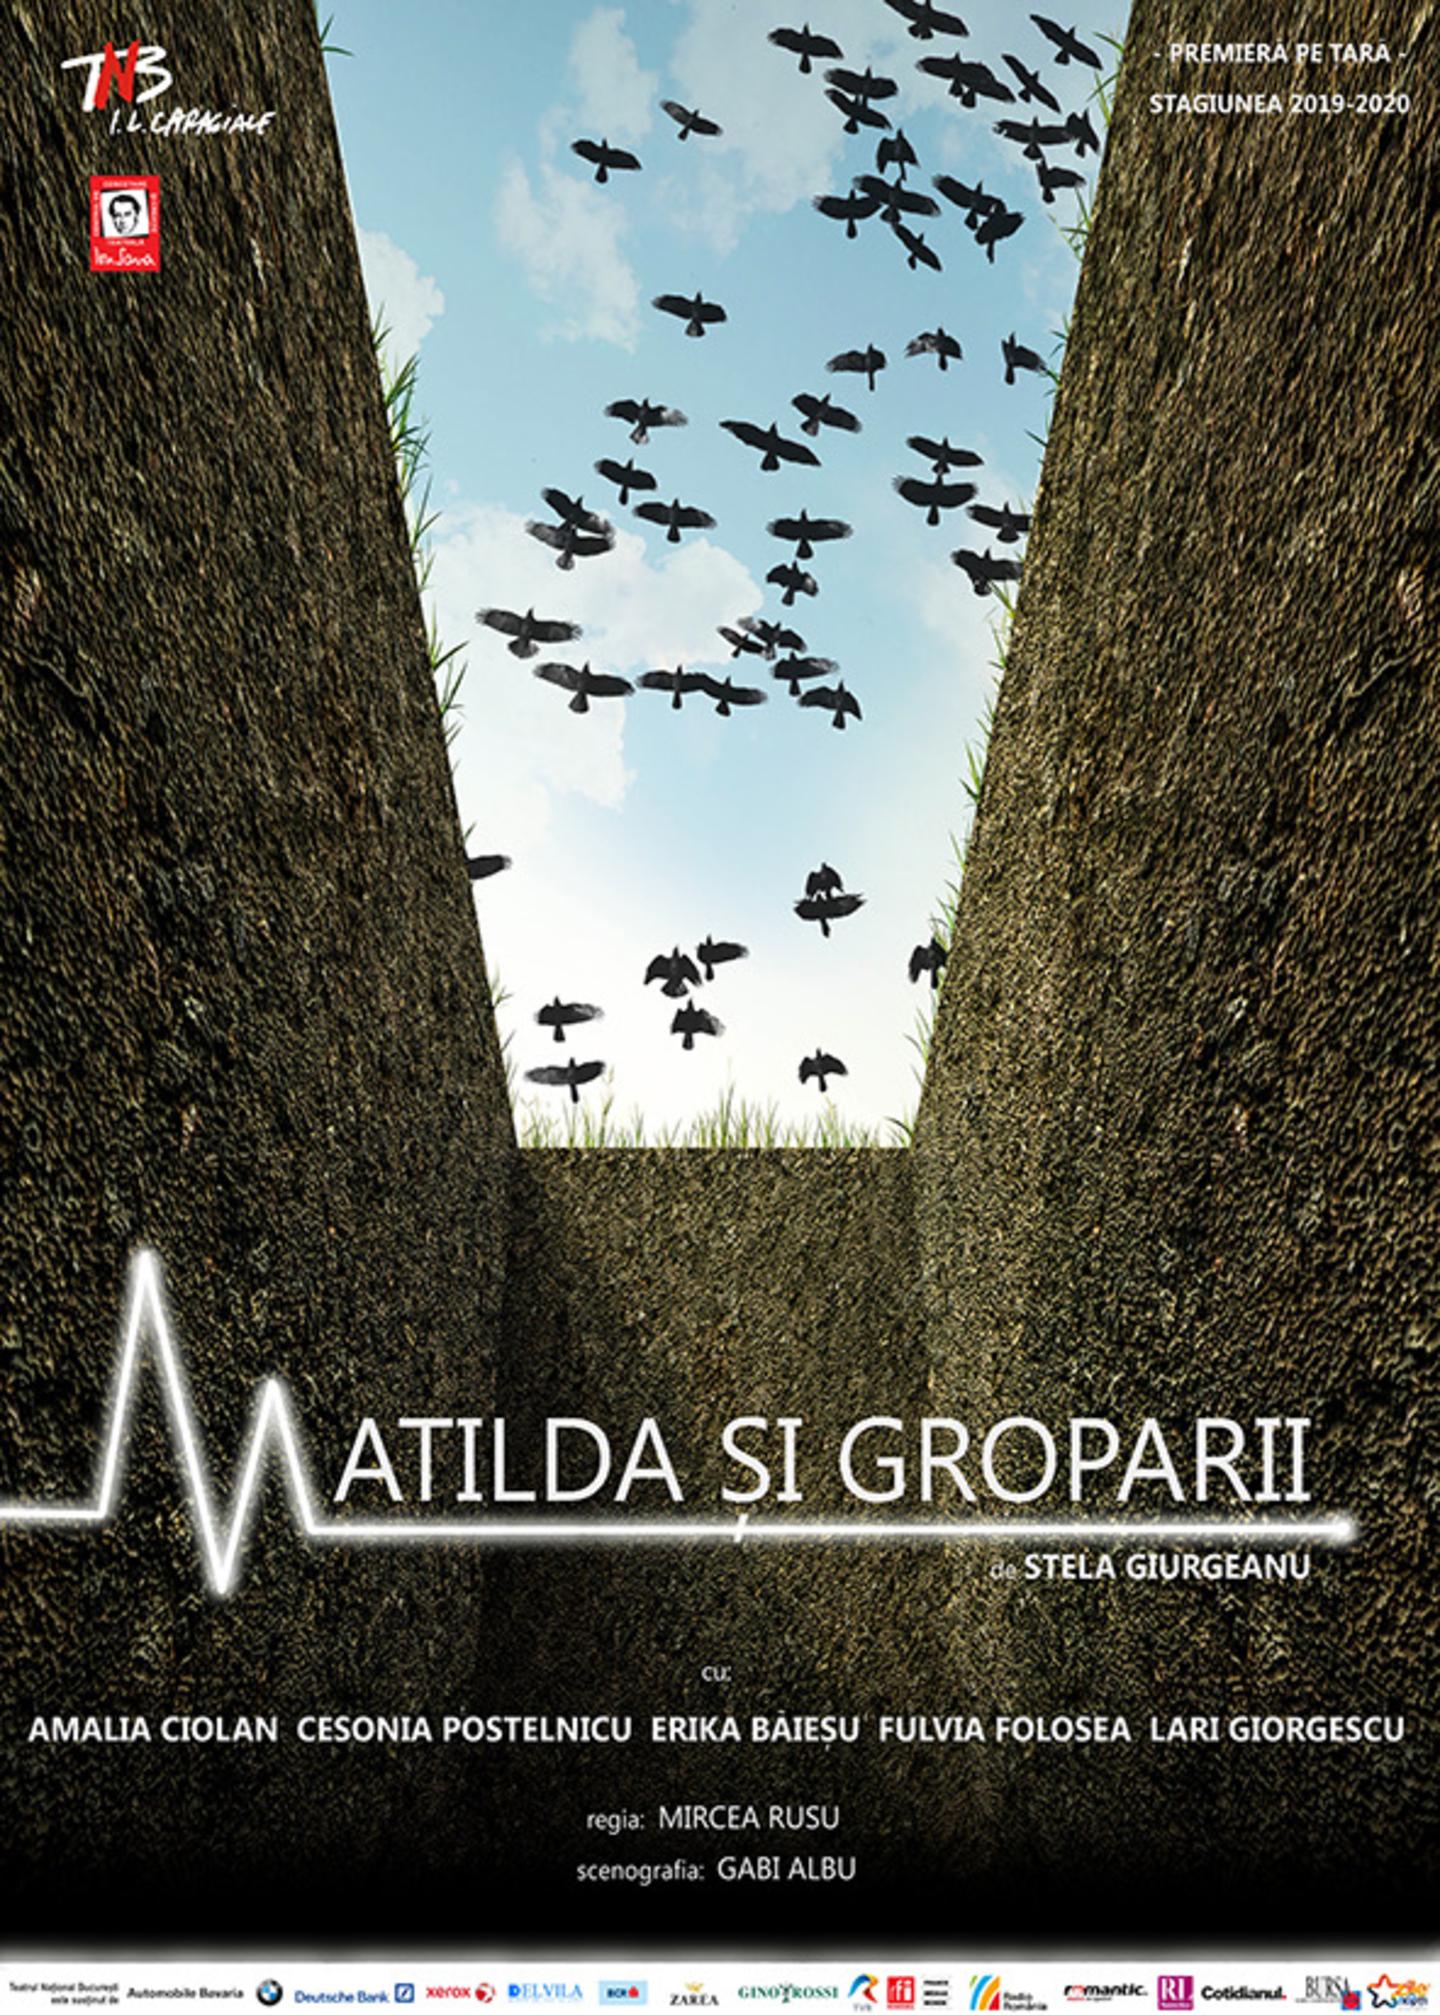 Matilda si groparii de Stela Giurgeanu - TNB AFIS